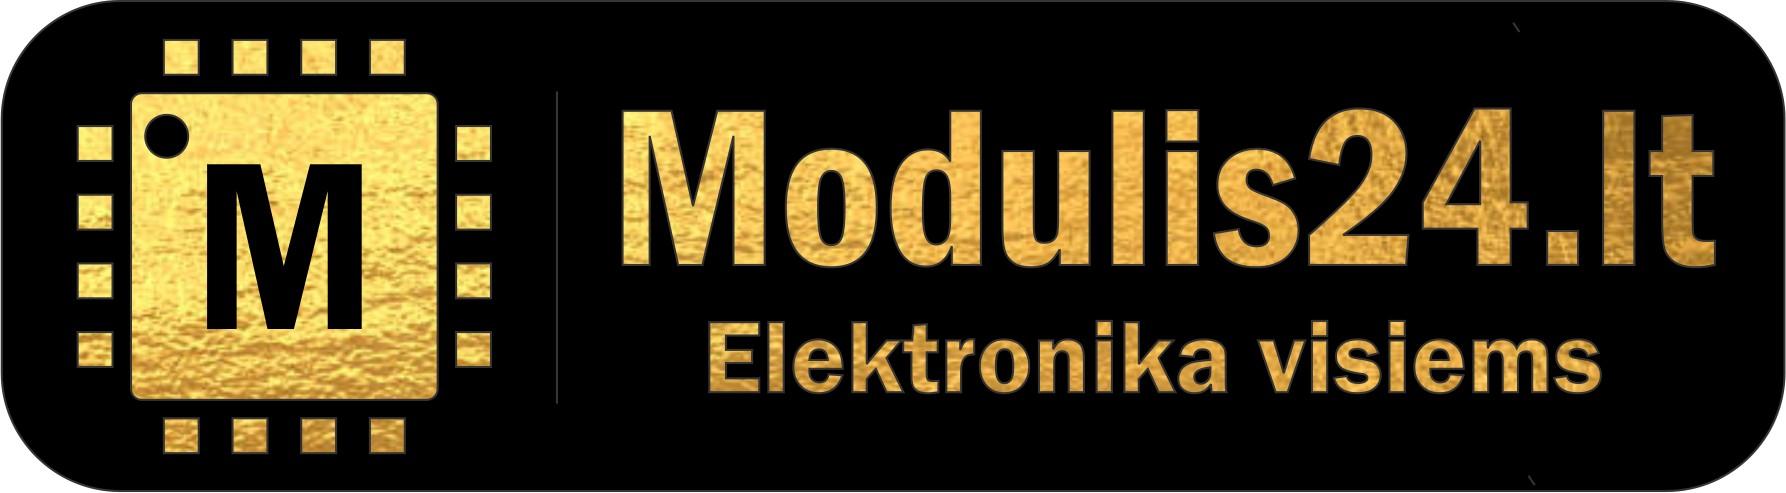 Modulis24.lt